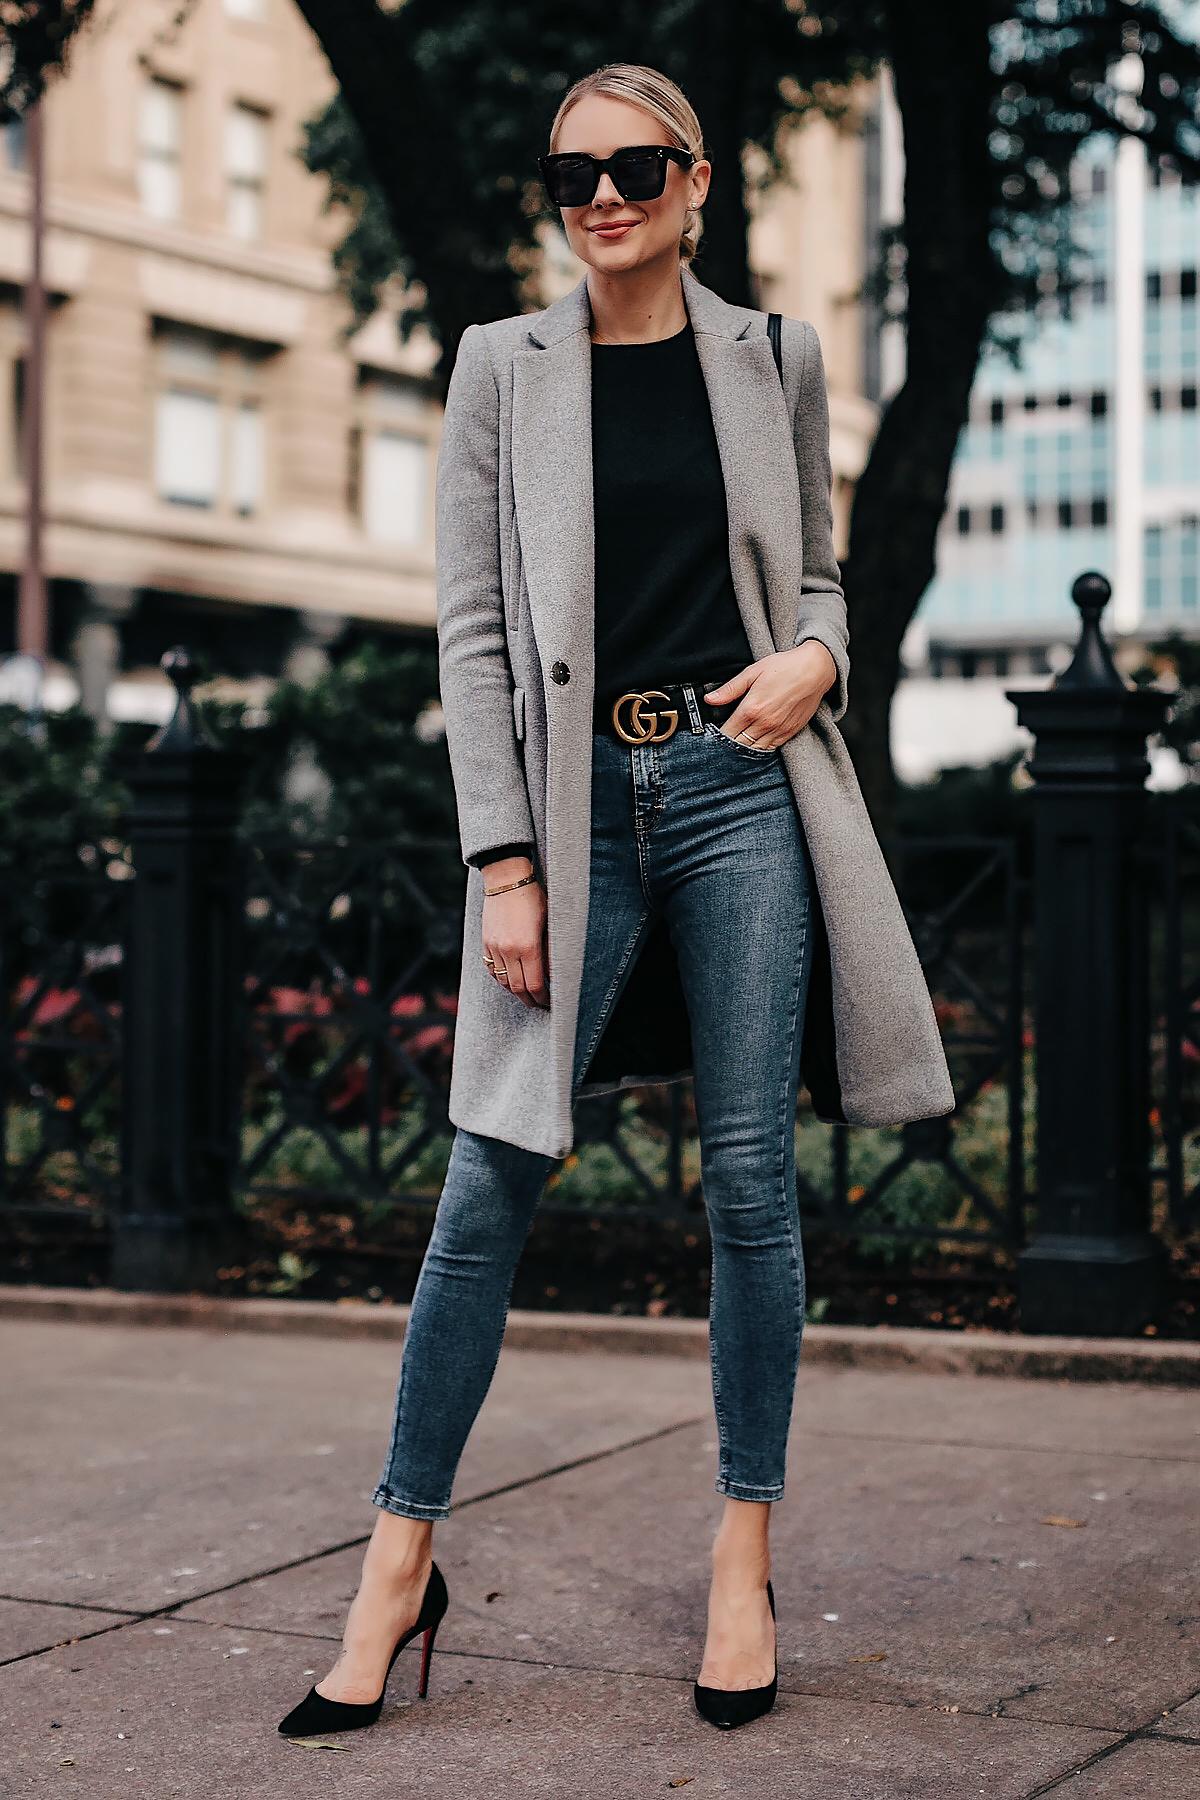 Blonde Woman Wearing Zara Grey Wool Coat Black Sweater Denim Skinny Jeans Gucci Belt Black Pumps Fashion Jackson San Diego Fashion Blogger Street Style